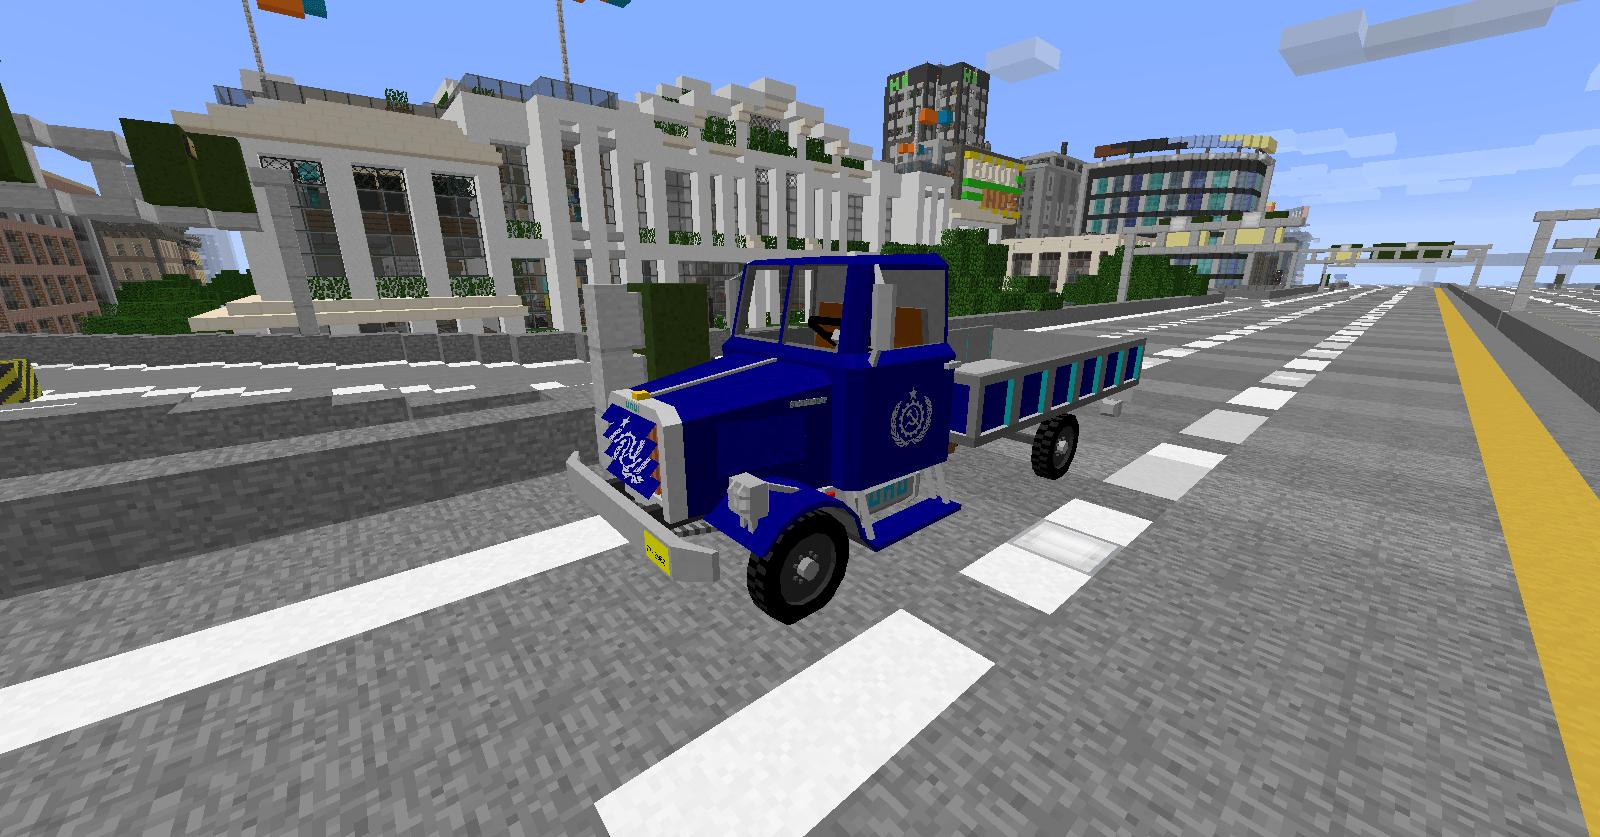 Пак машин BlackThorne Civilian для flan's мода minecraft 1.12.2 1.8 1.7.10